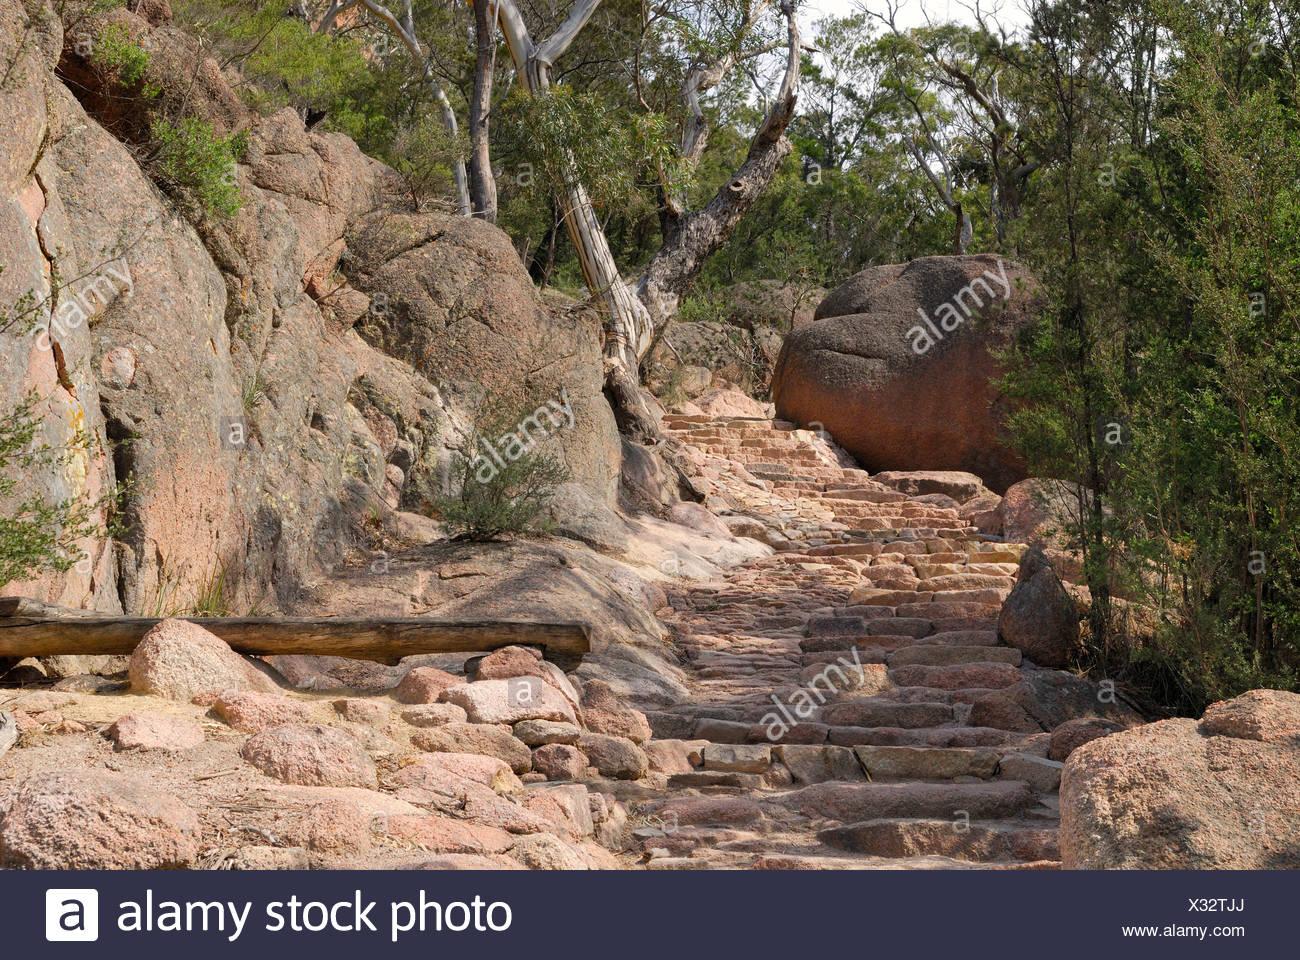 Footpath with stone steps through the red granite rocks of the Hazards Range, Freycinet Peninsula, Tasmania, Australia - Stock Image